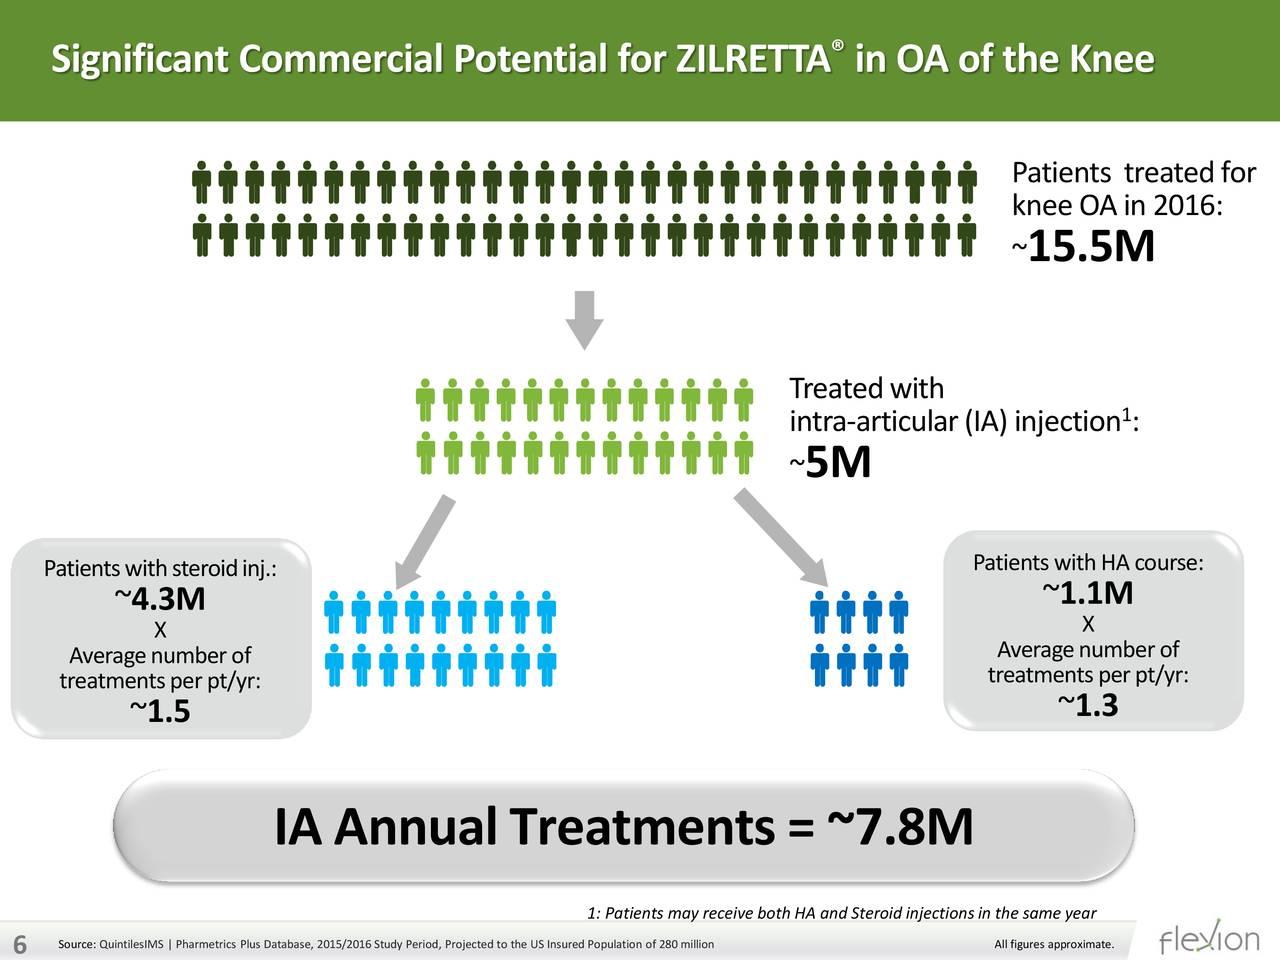 Zilretta Market Potential